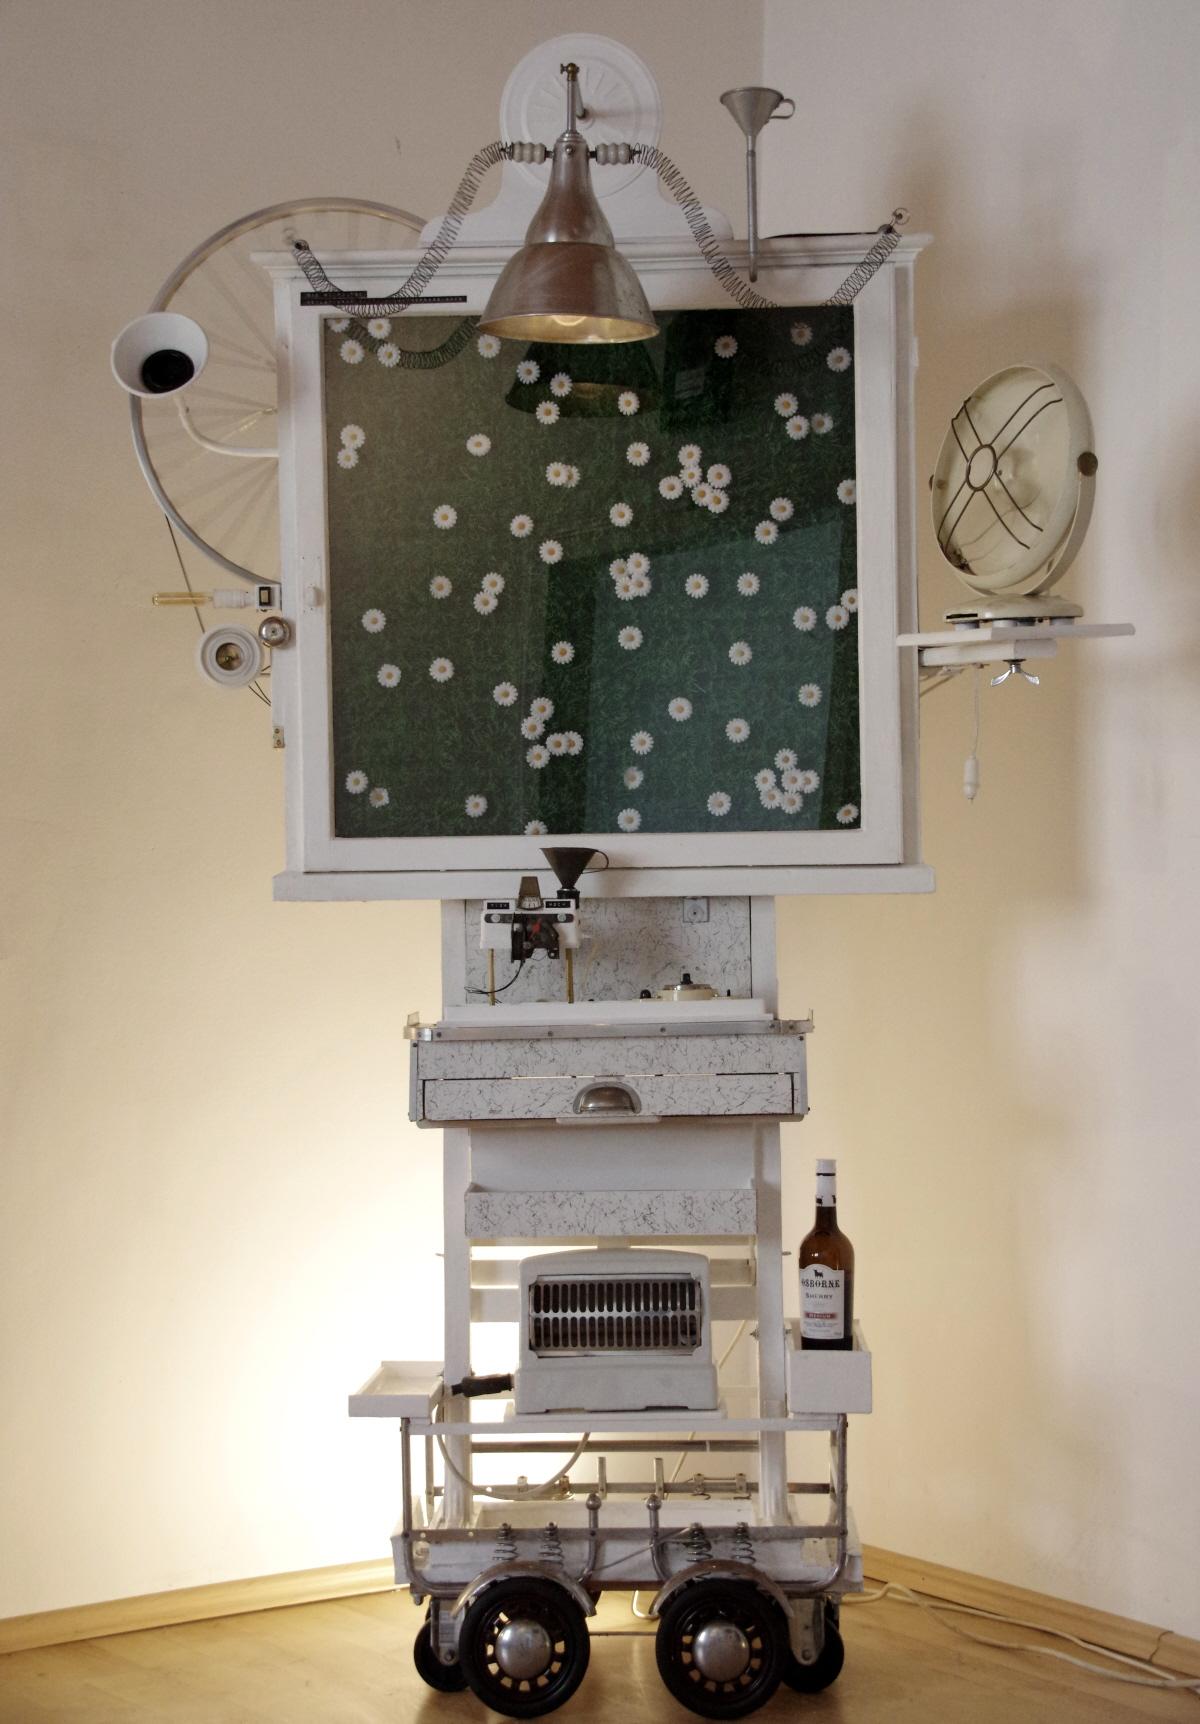 Melpomene - LowTech Instruments - © Charly-Ann Cobdak